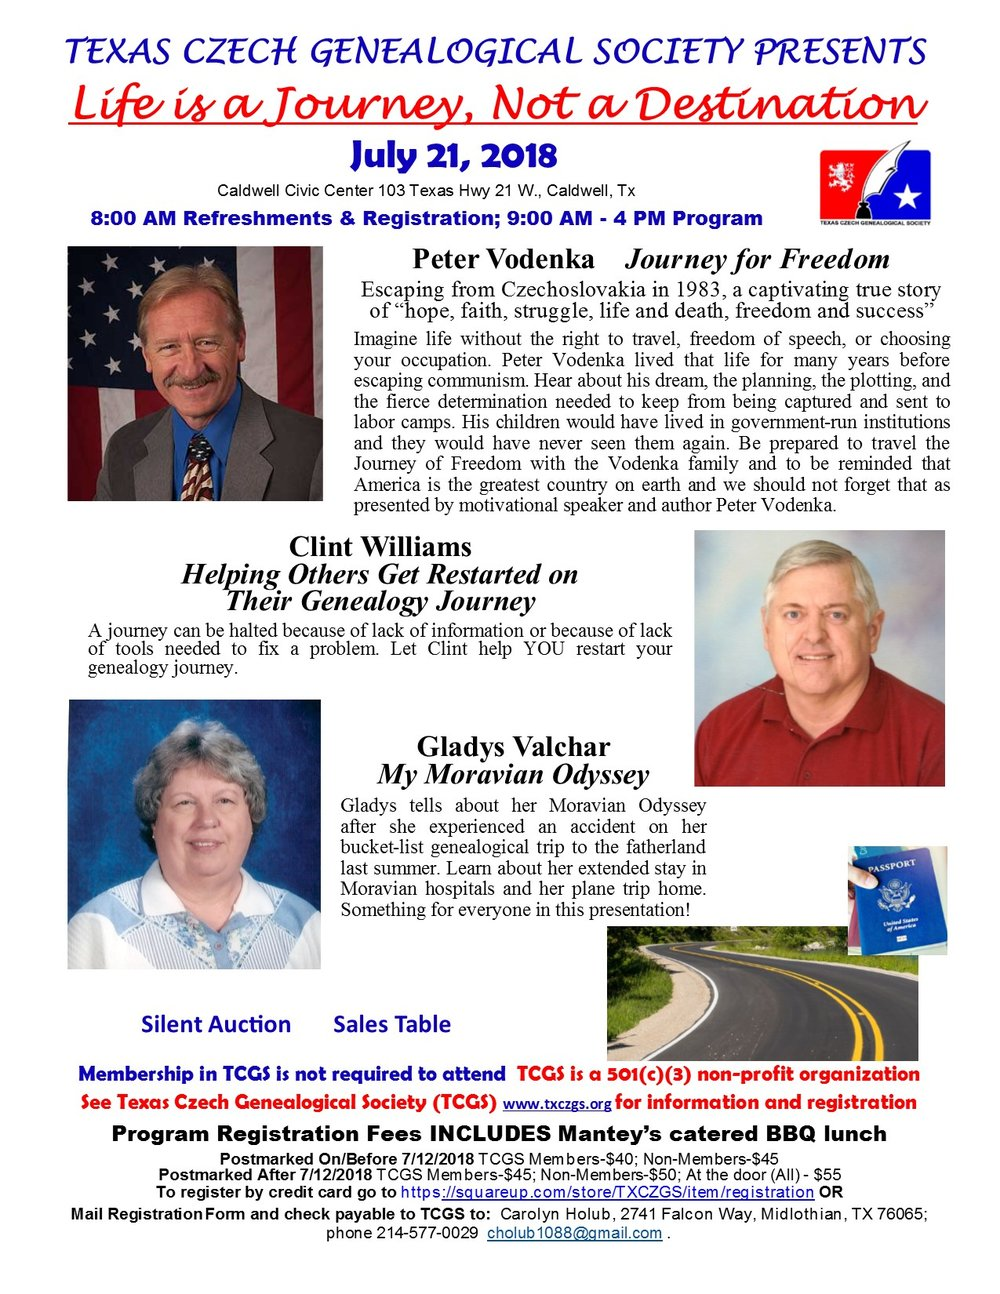 TCGS-Life's a    Journey-07-21-18-flyer.jpg